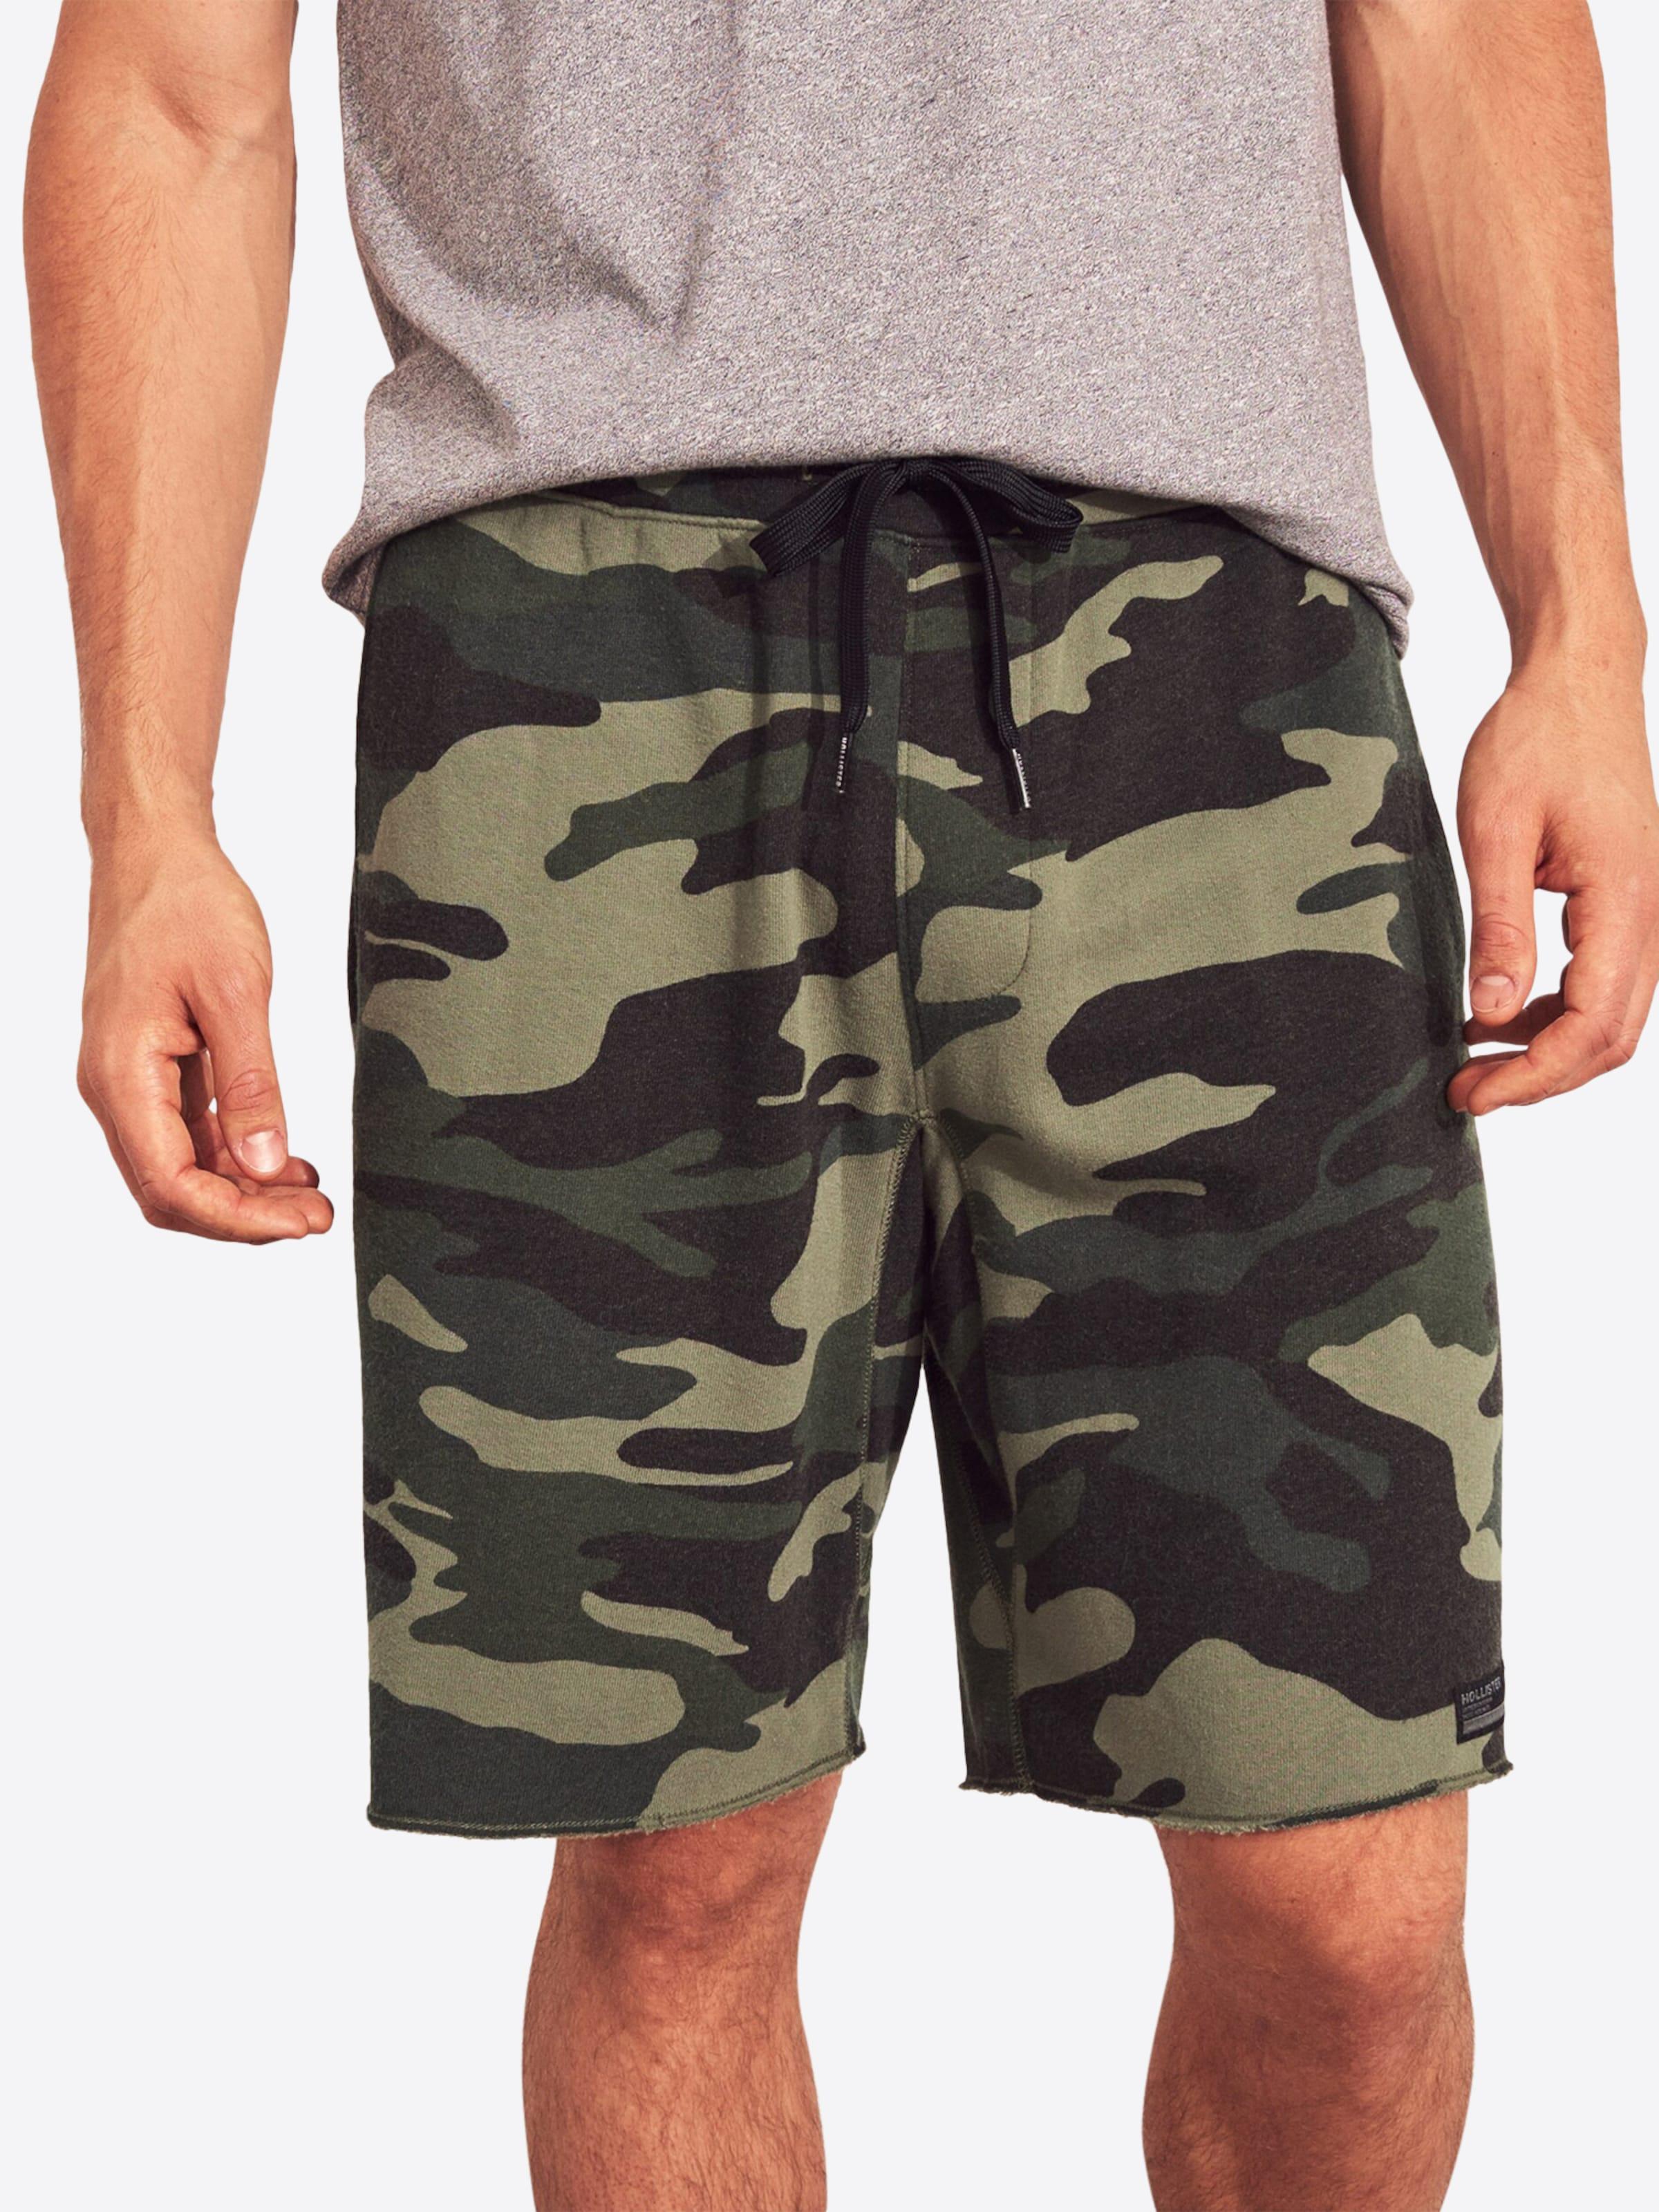 Pantalon Vert Pantalon Hollister En En Hollister Vert Foncé kZiOPwXuT